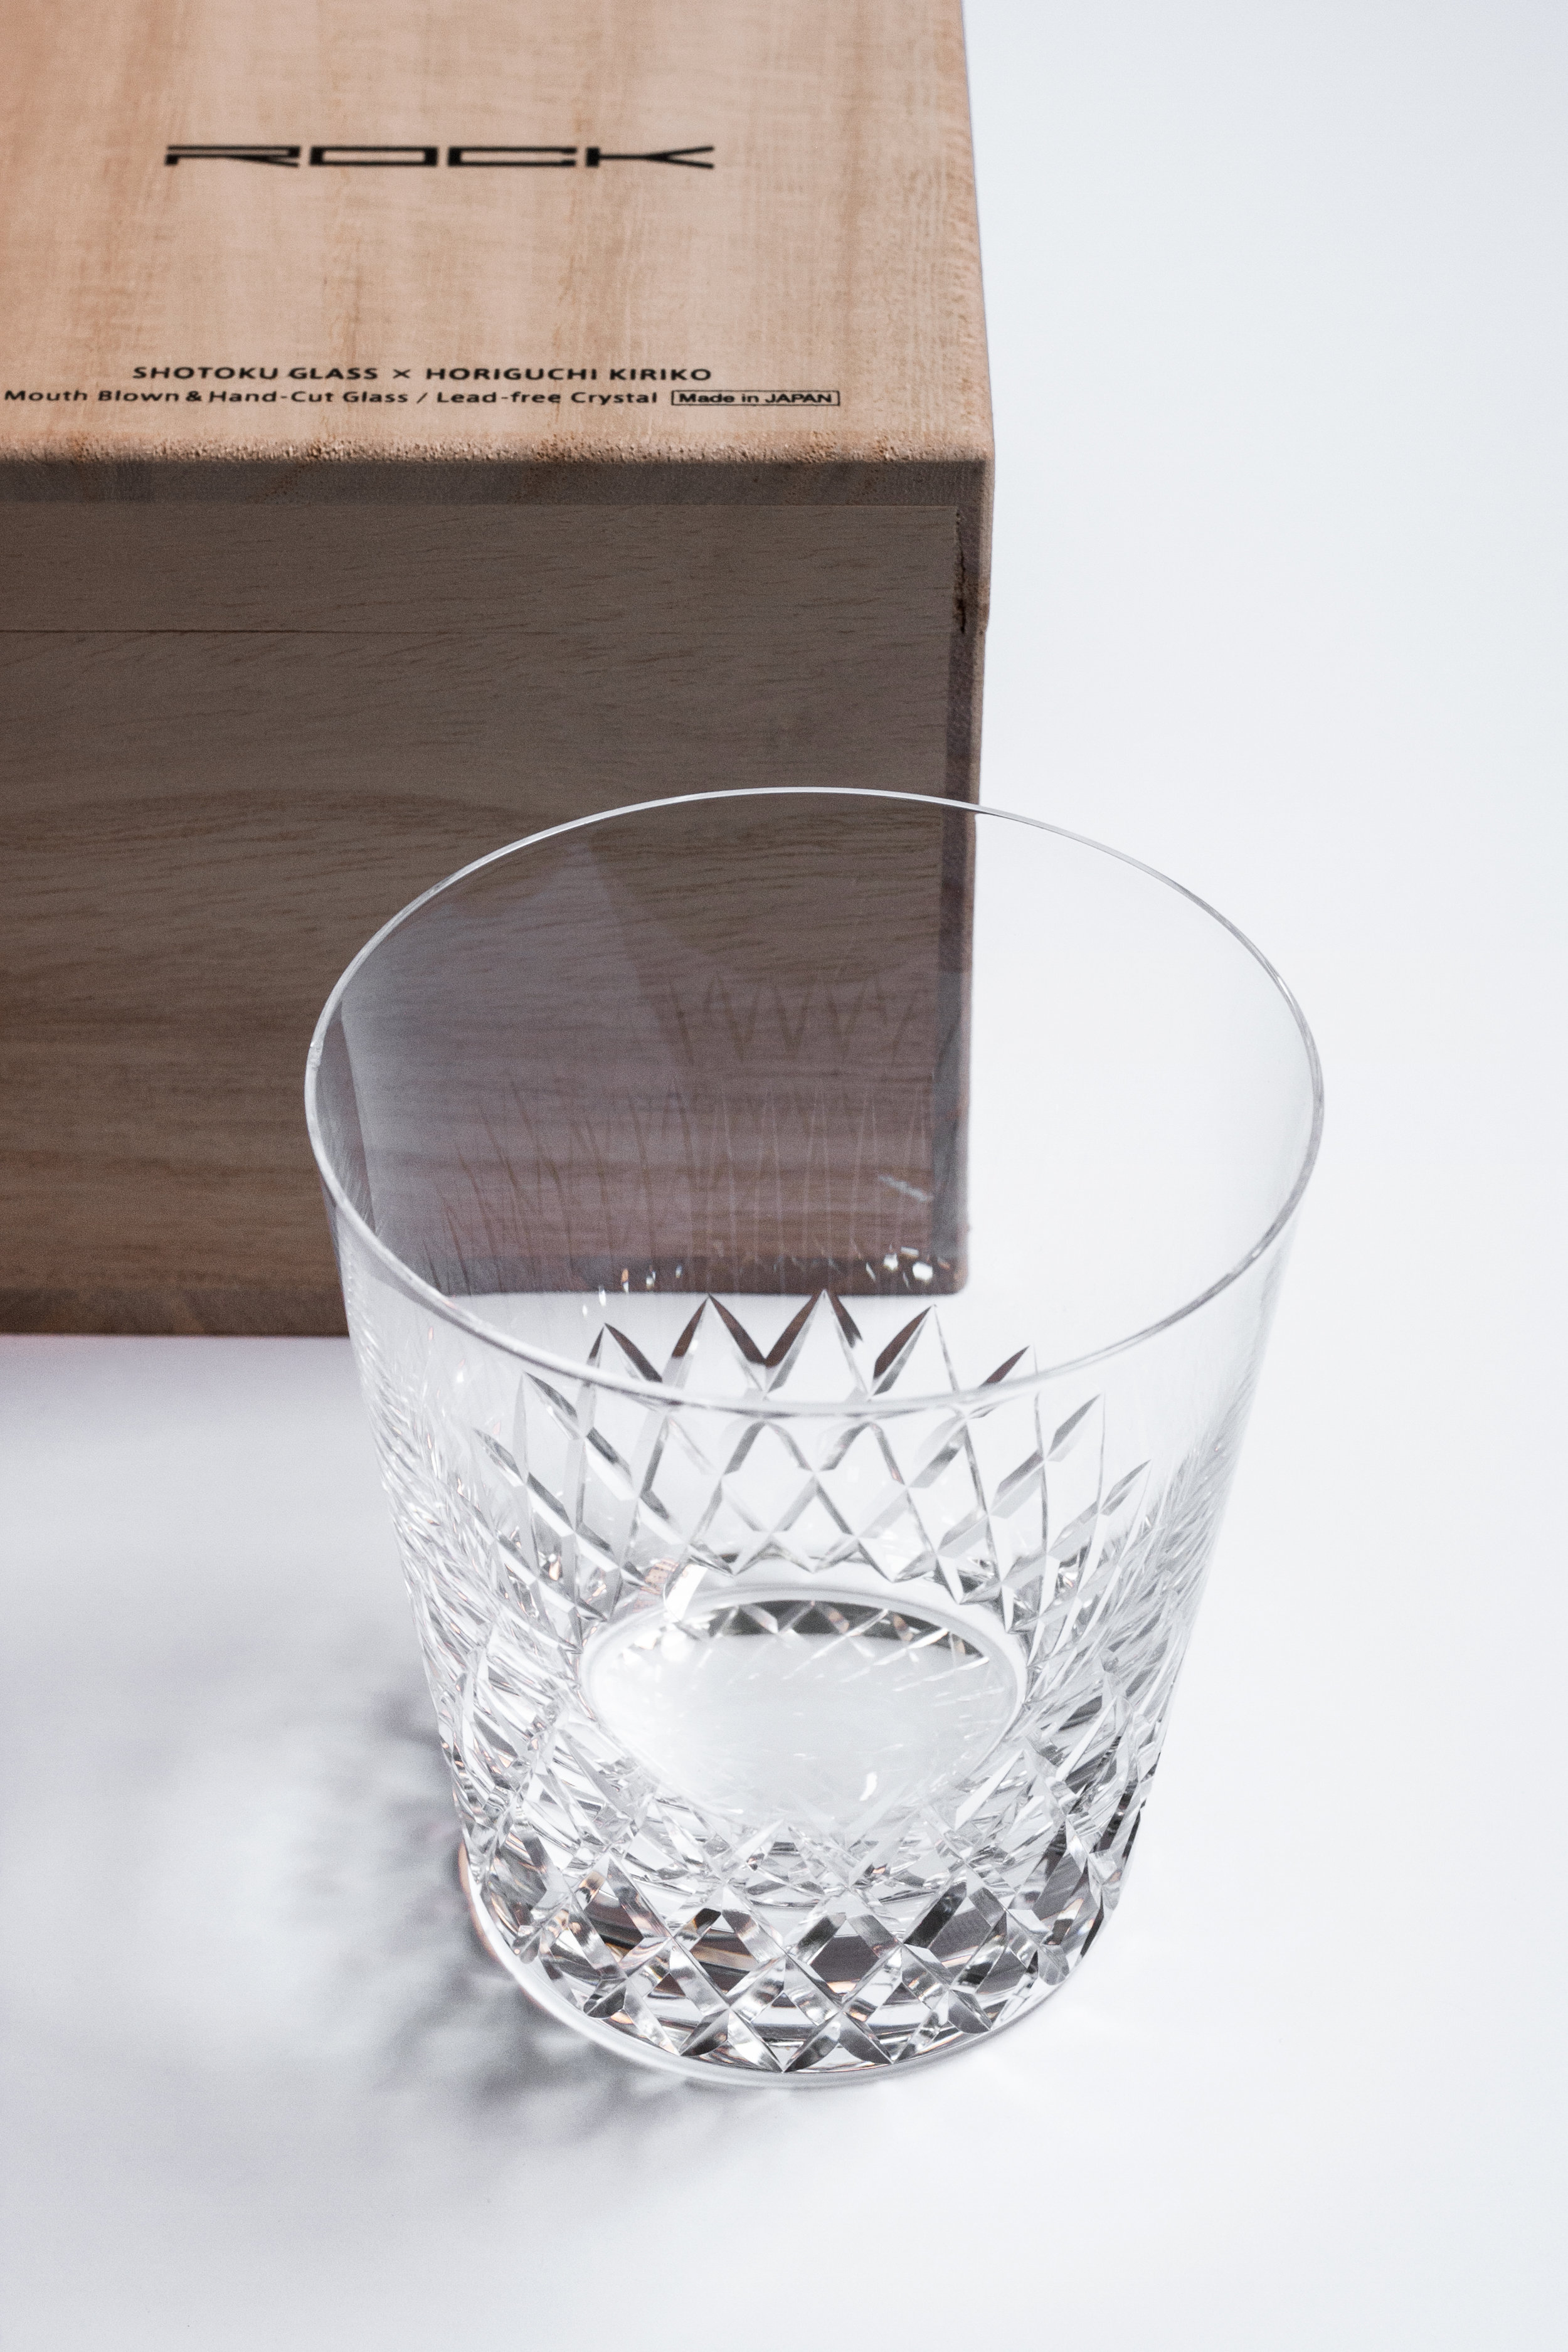 Rock glass #3